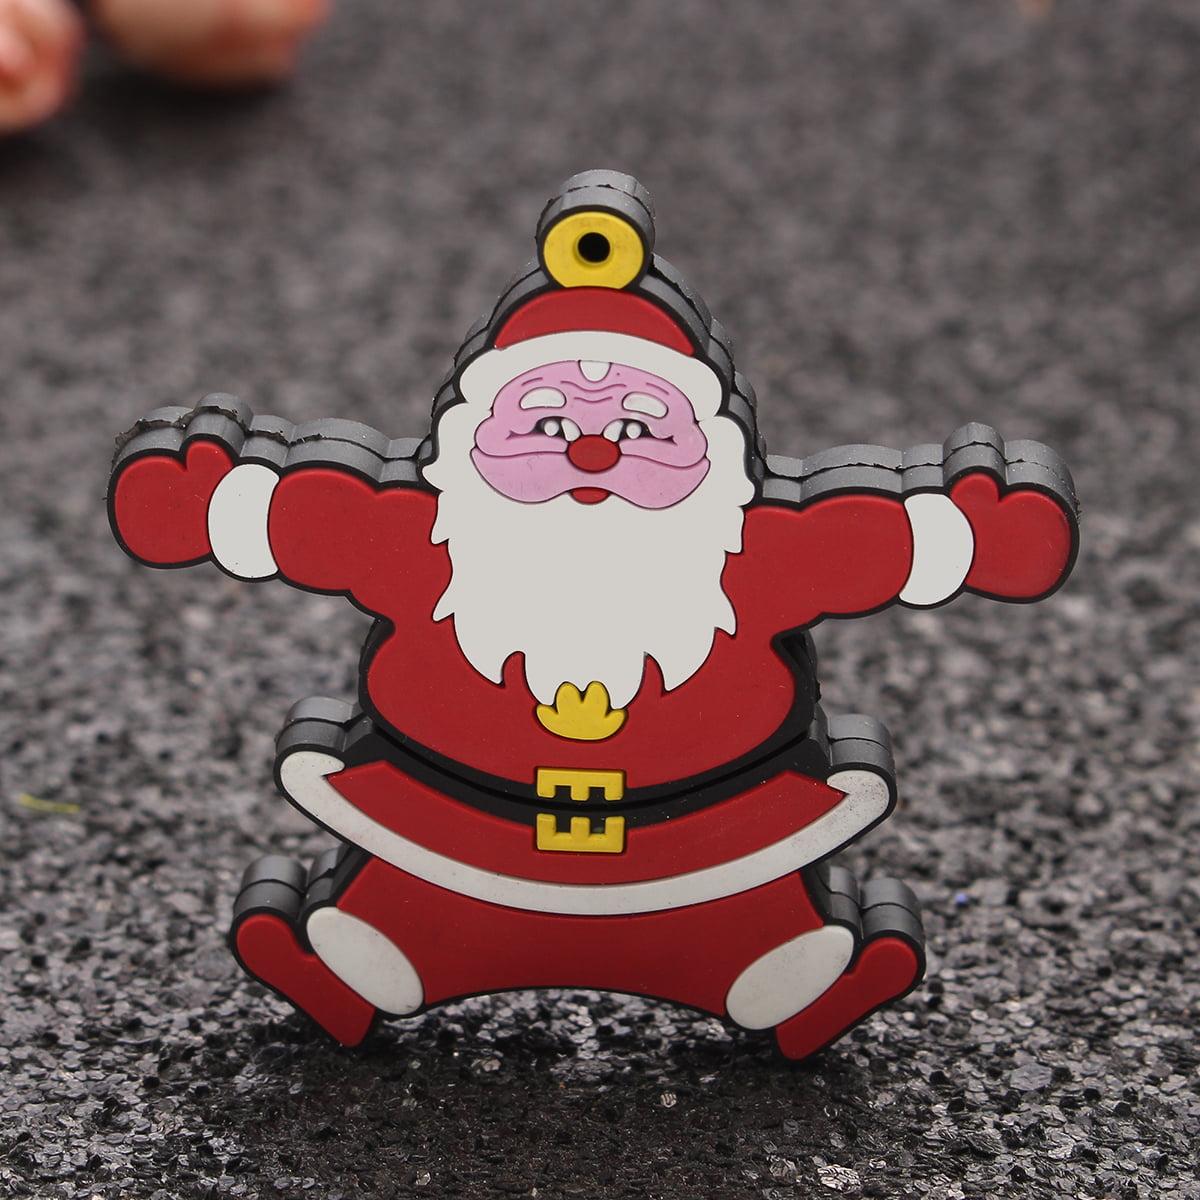 1GB Santa Claus USB2.0 Flash Drive Memory Stick Christmas Gifts